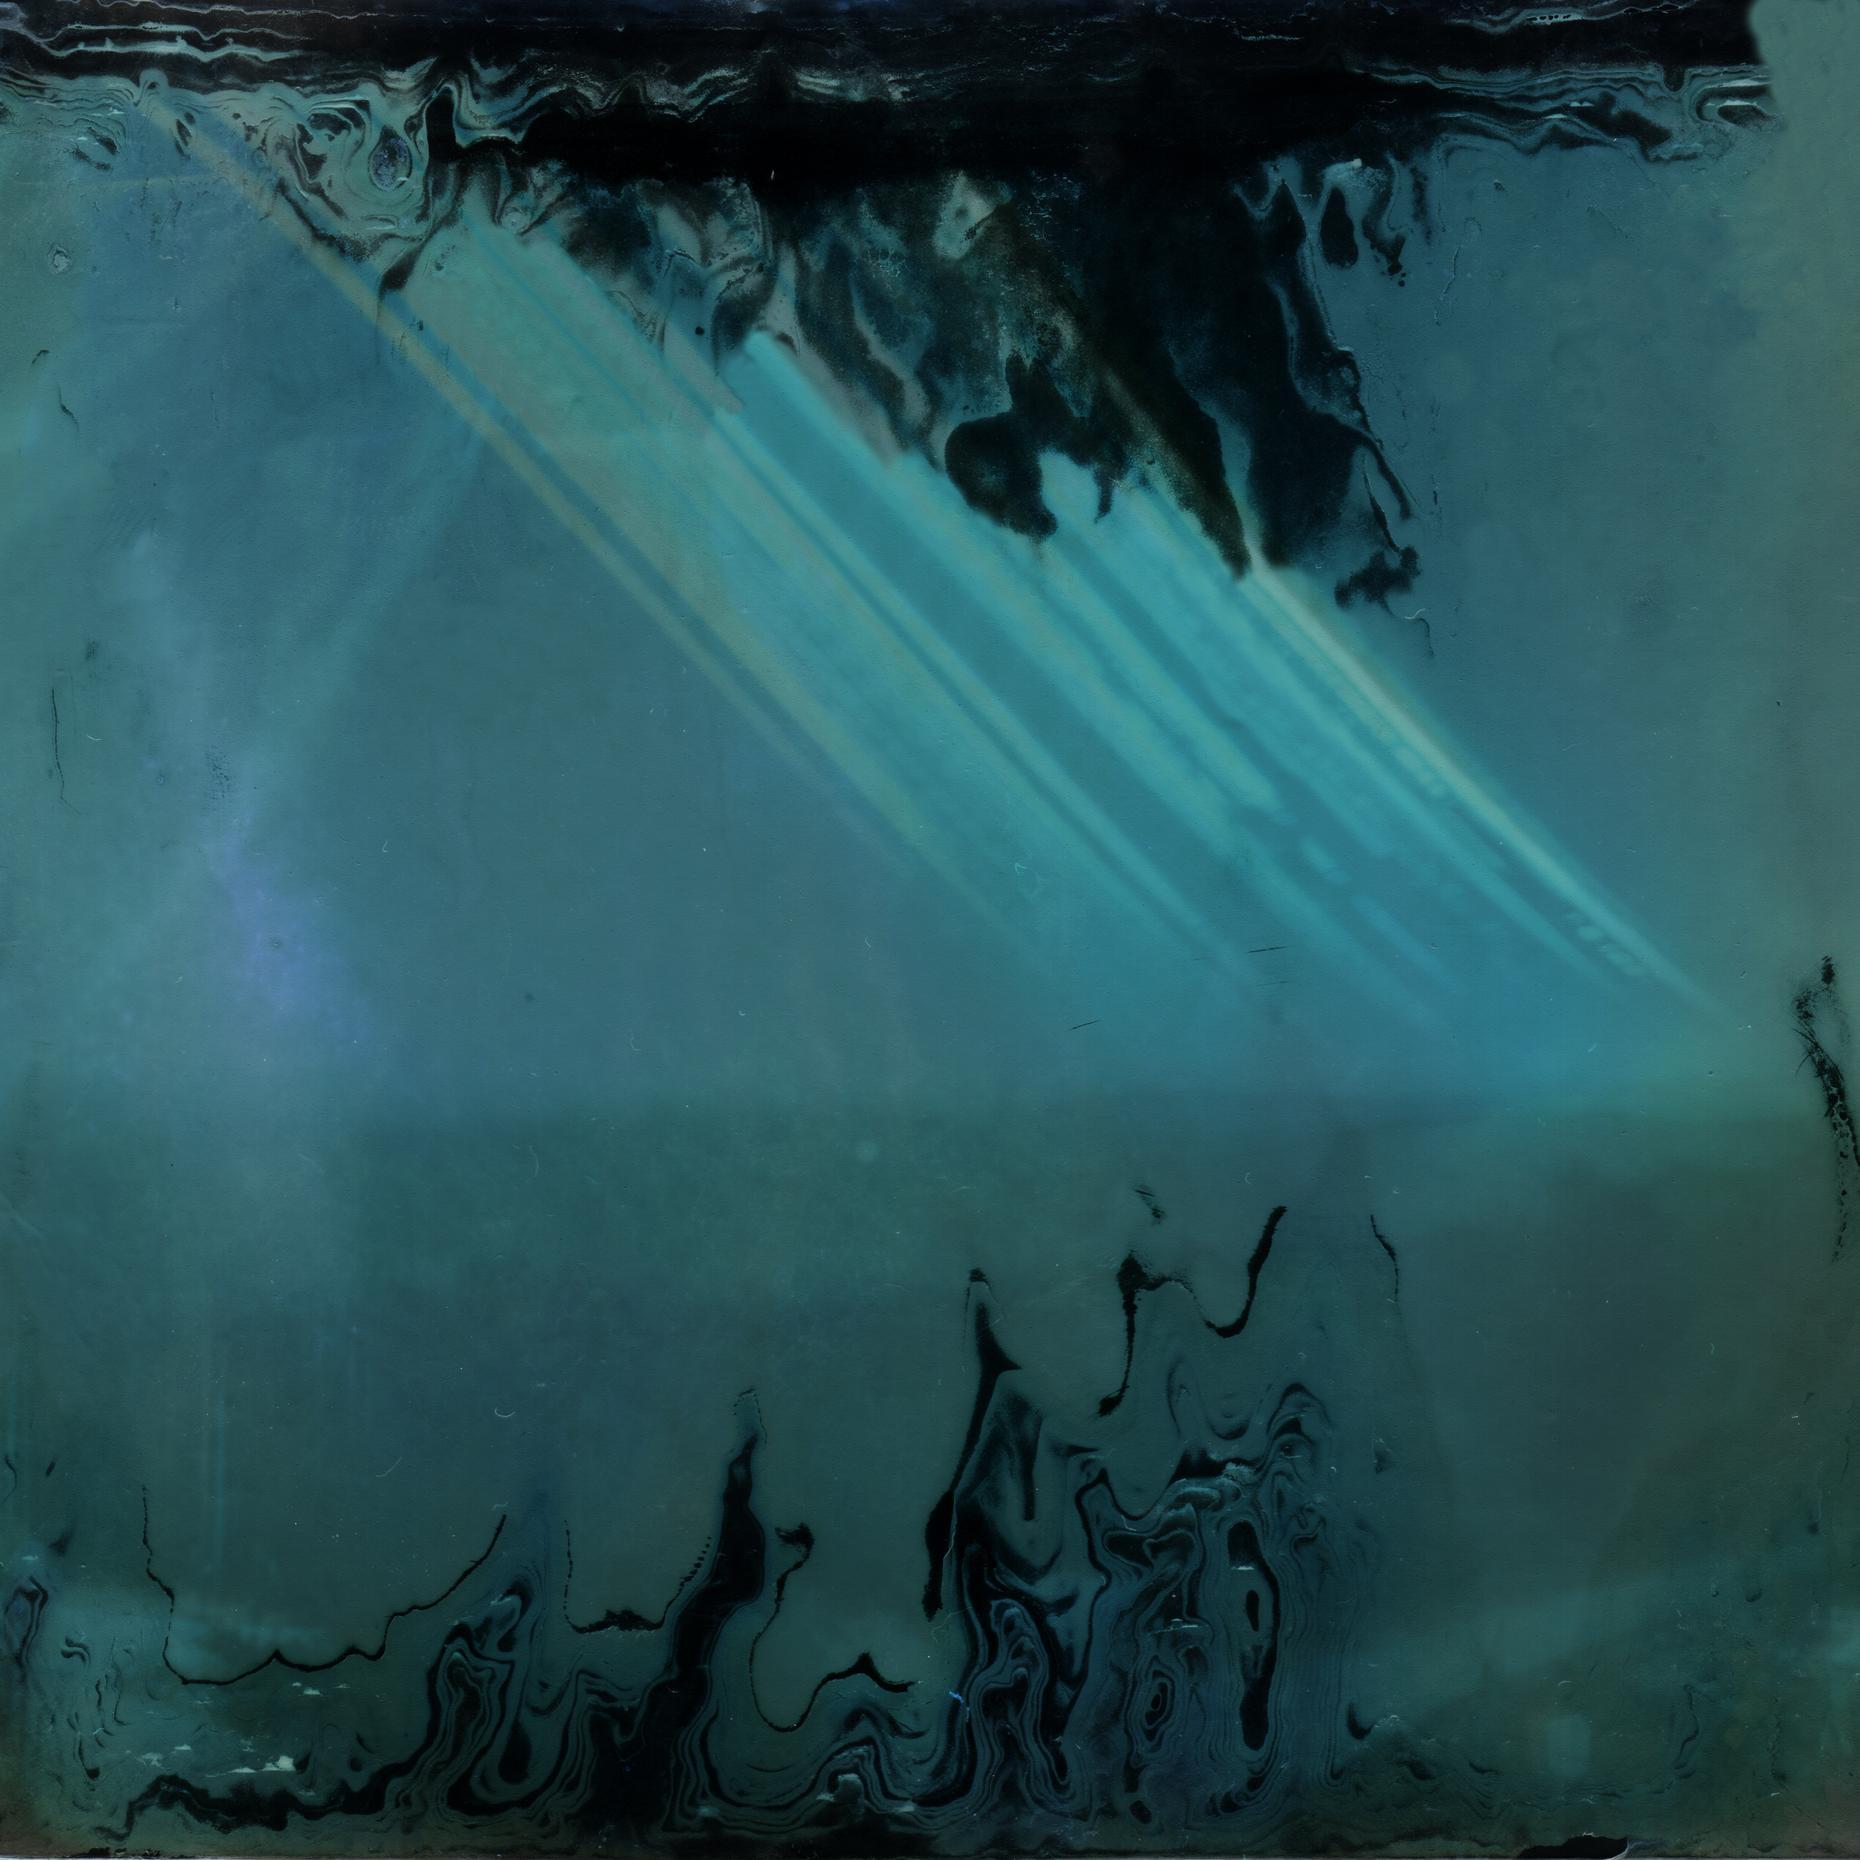 Art Decade's self-titled second album.